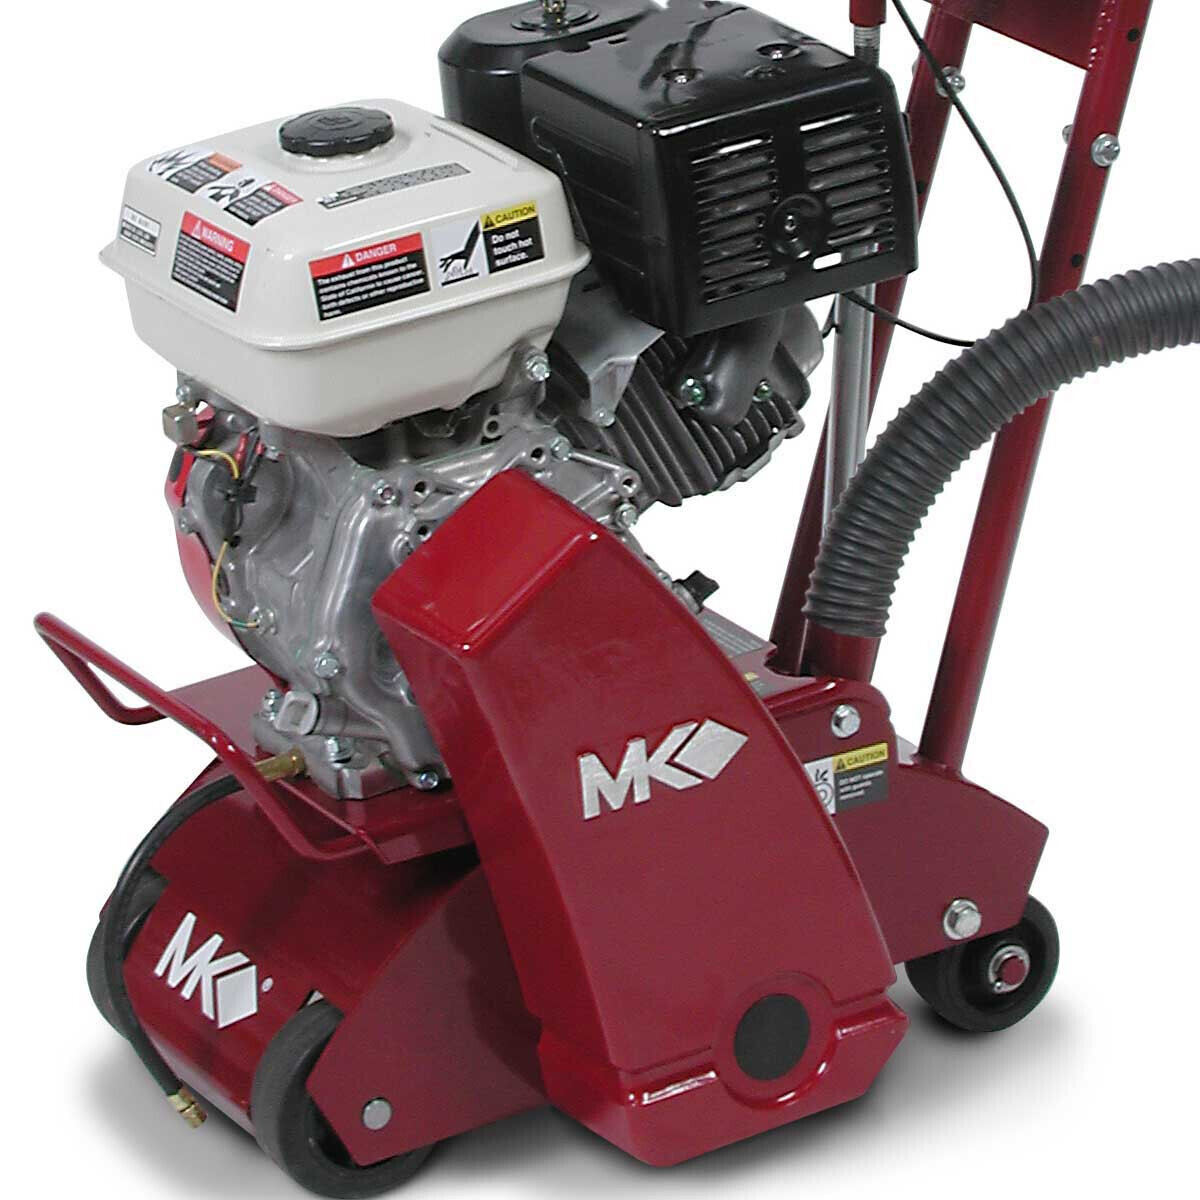 MK Diamond Gas 8 inch Scarifier